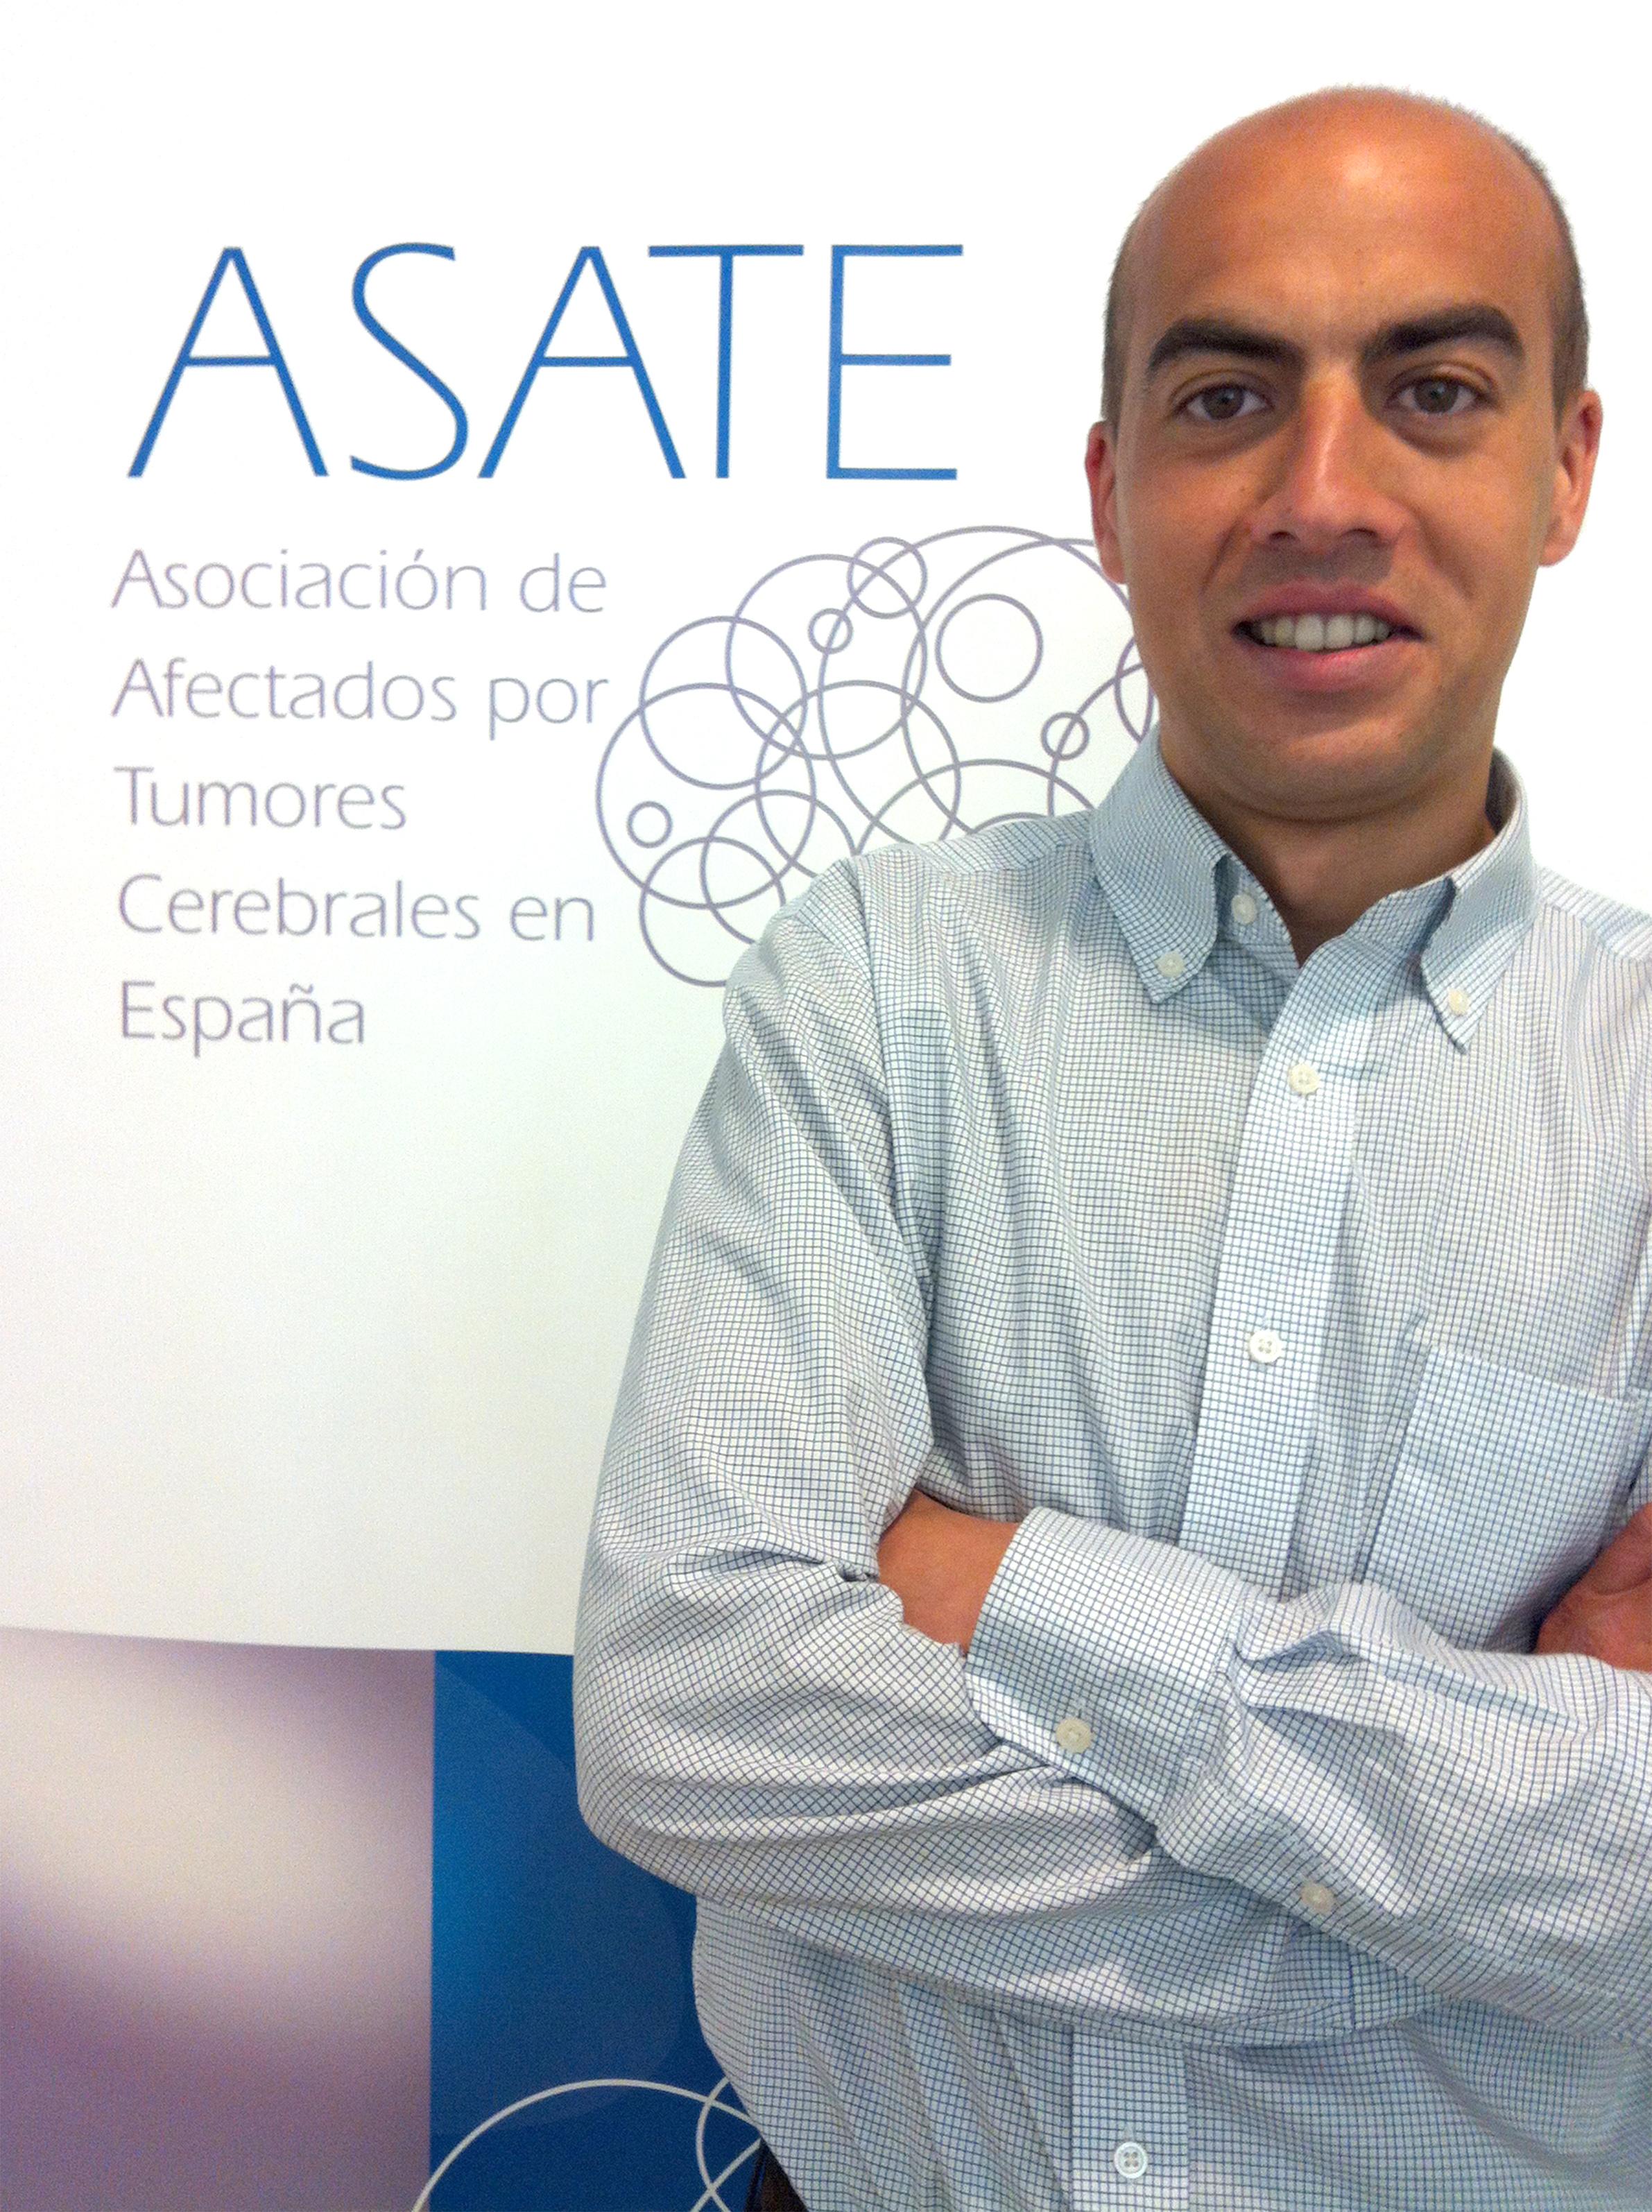 ASATE - Oscar Prieto